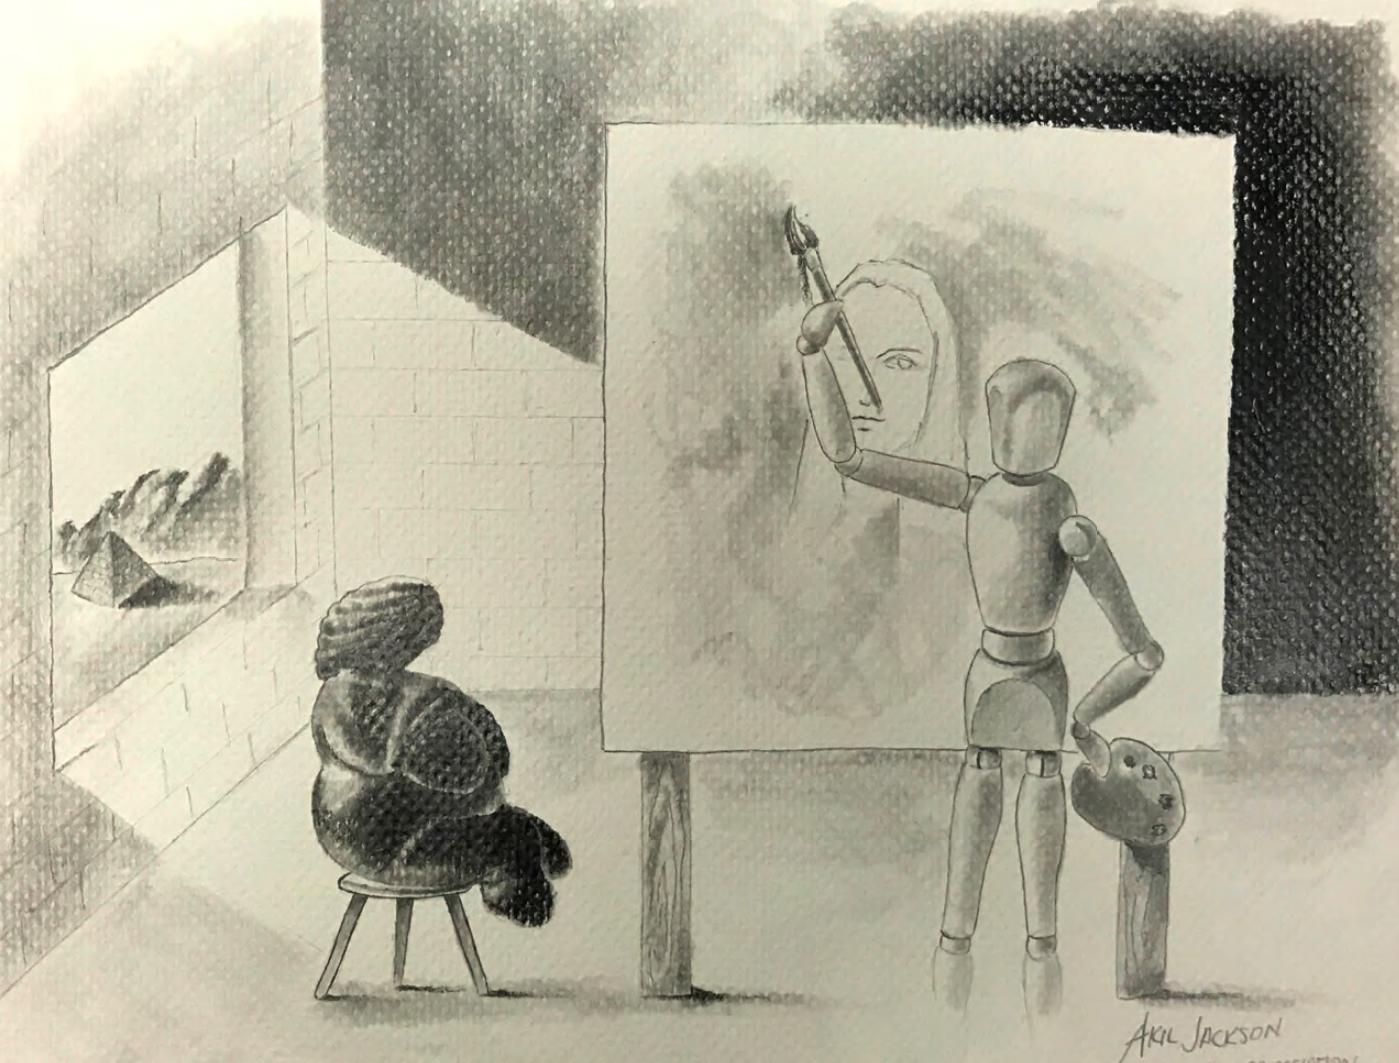 Student Work #10: Origins of Civilization